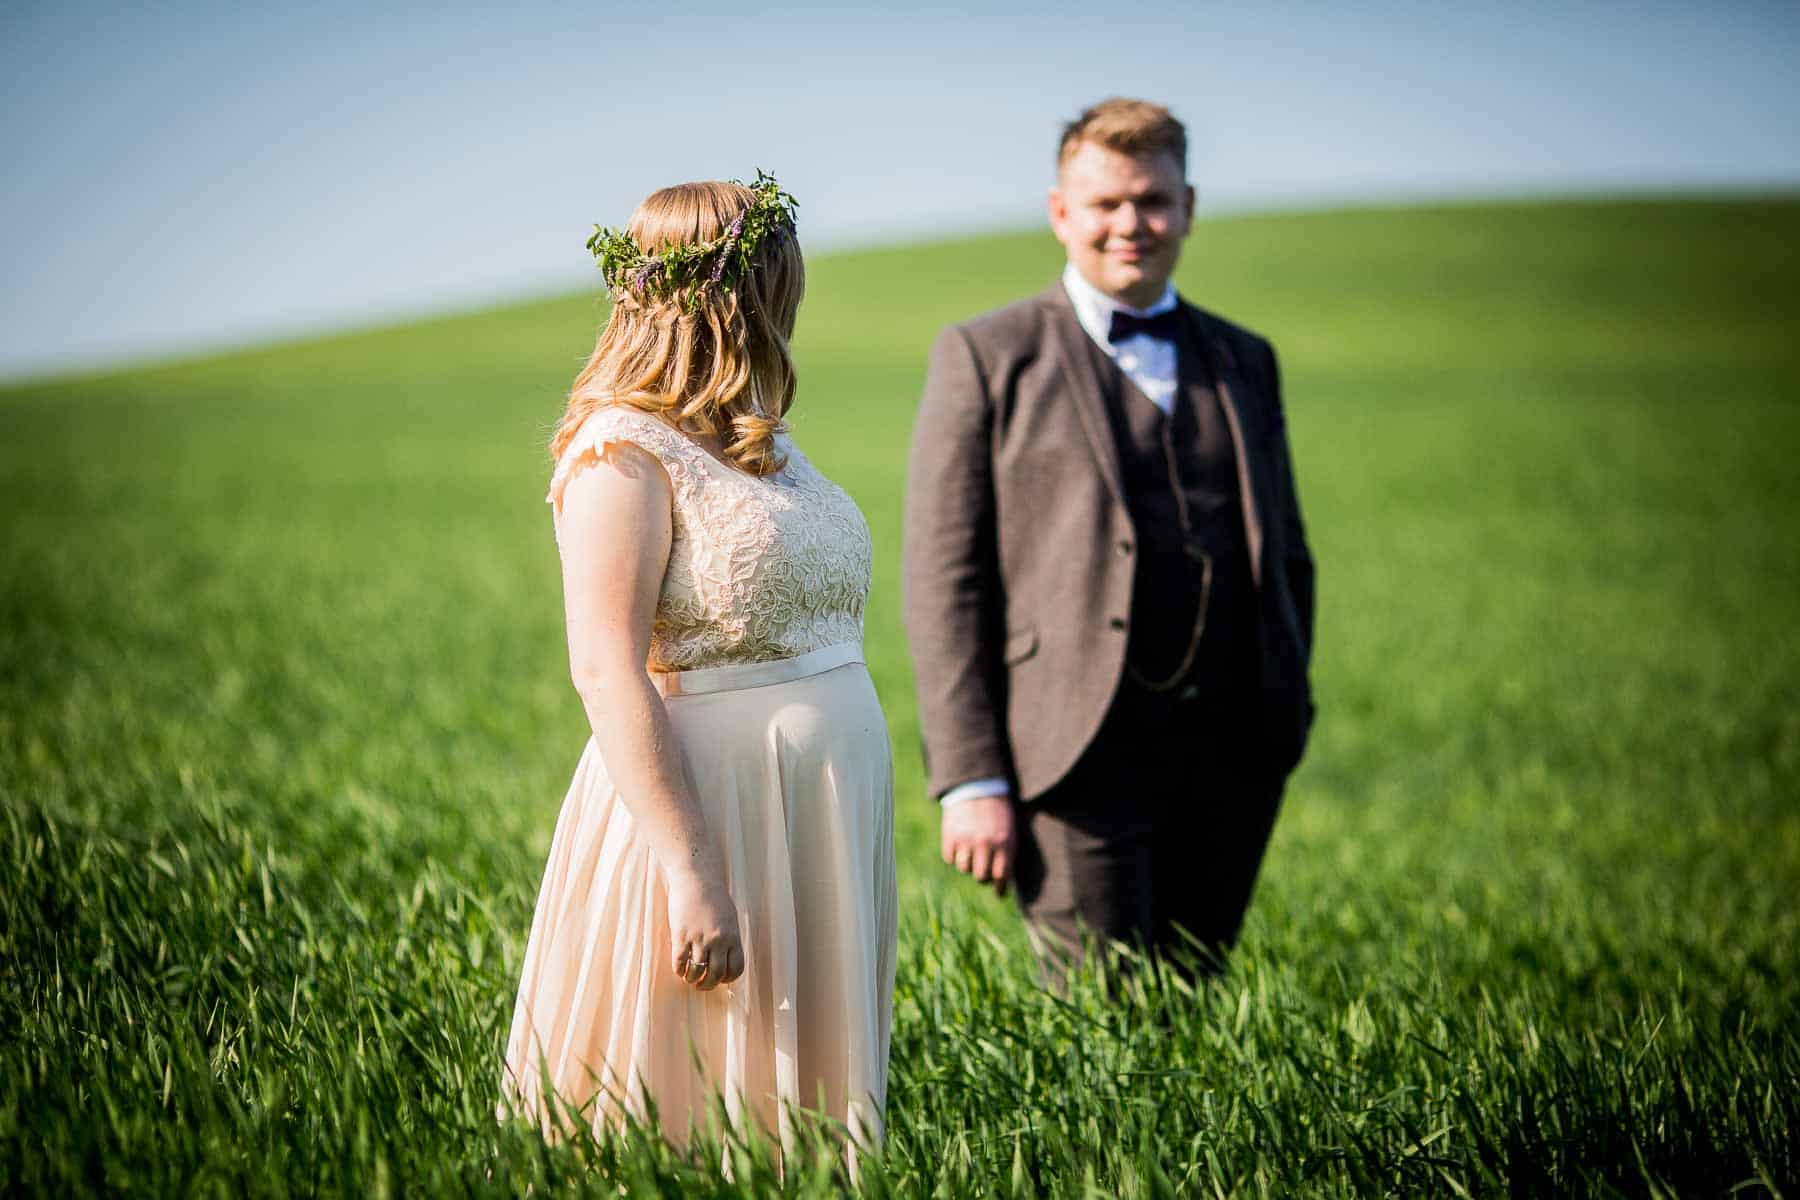 brudeparret i mark